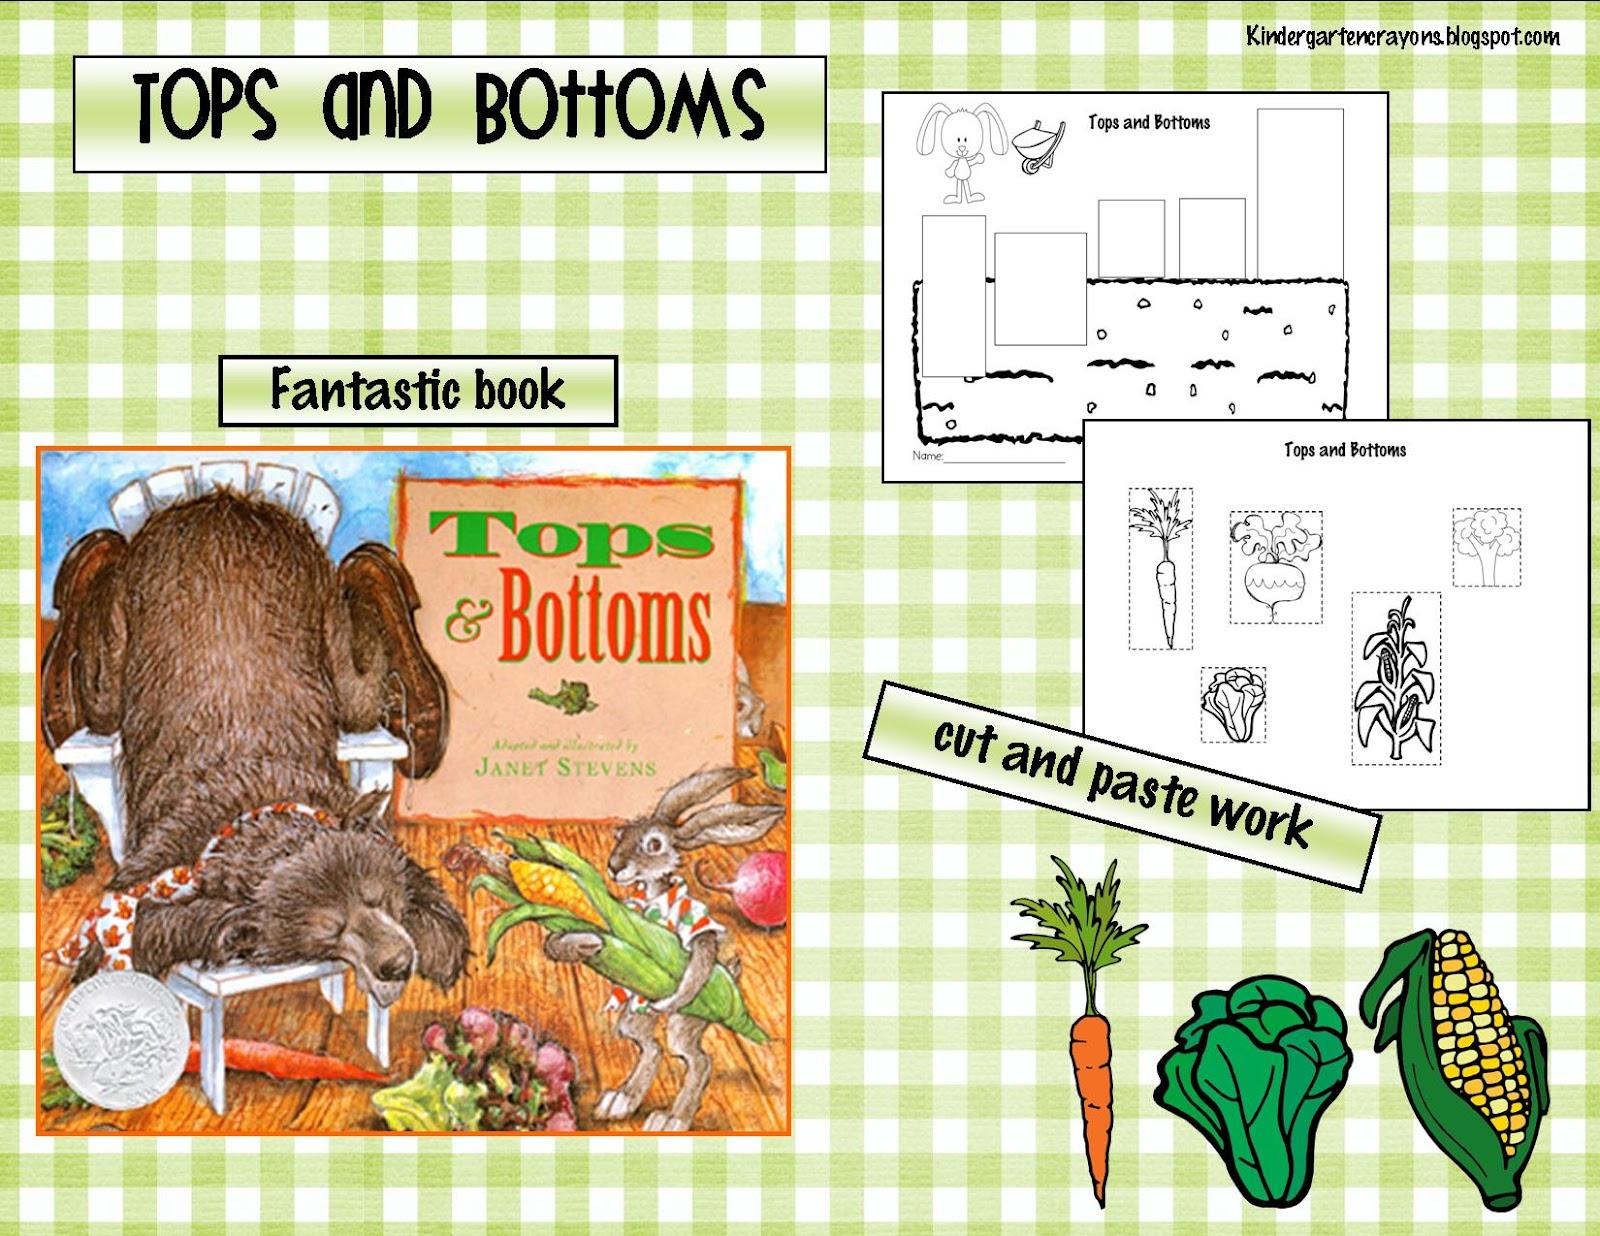 Bottoms by Janet Stevens